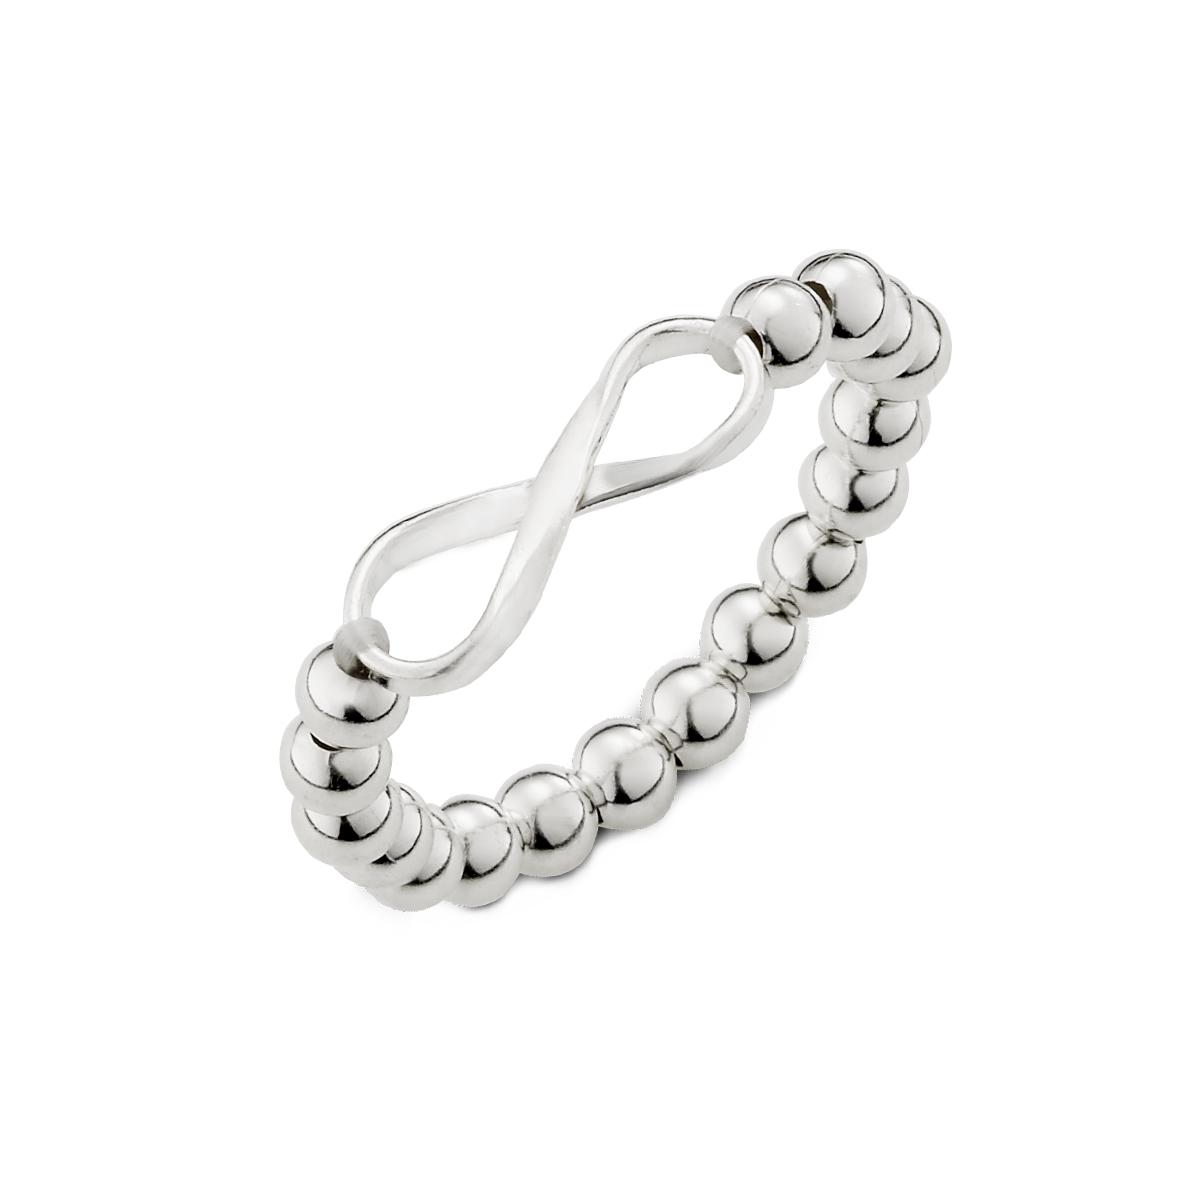 KSW322 點滴意象-無限眷戀珠珠戒指